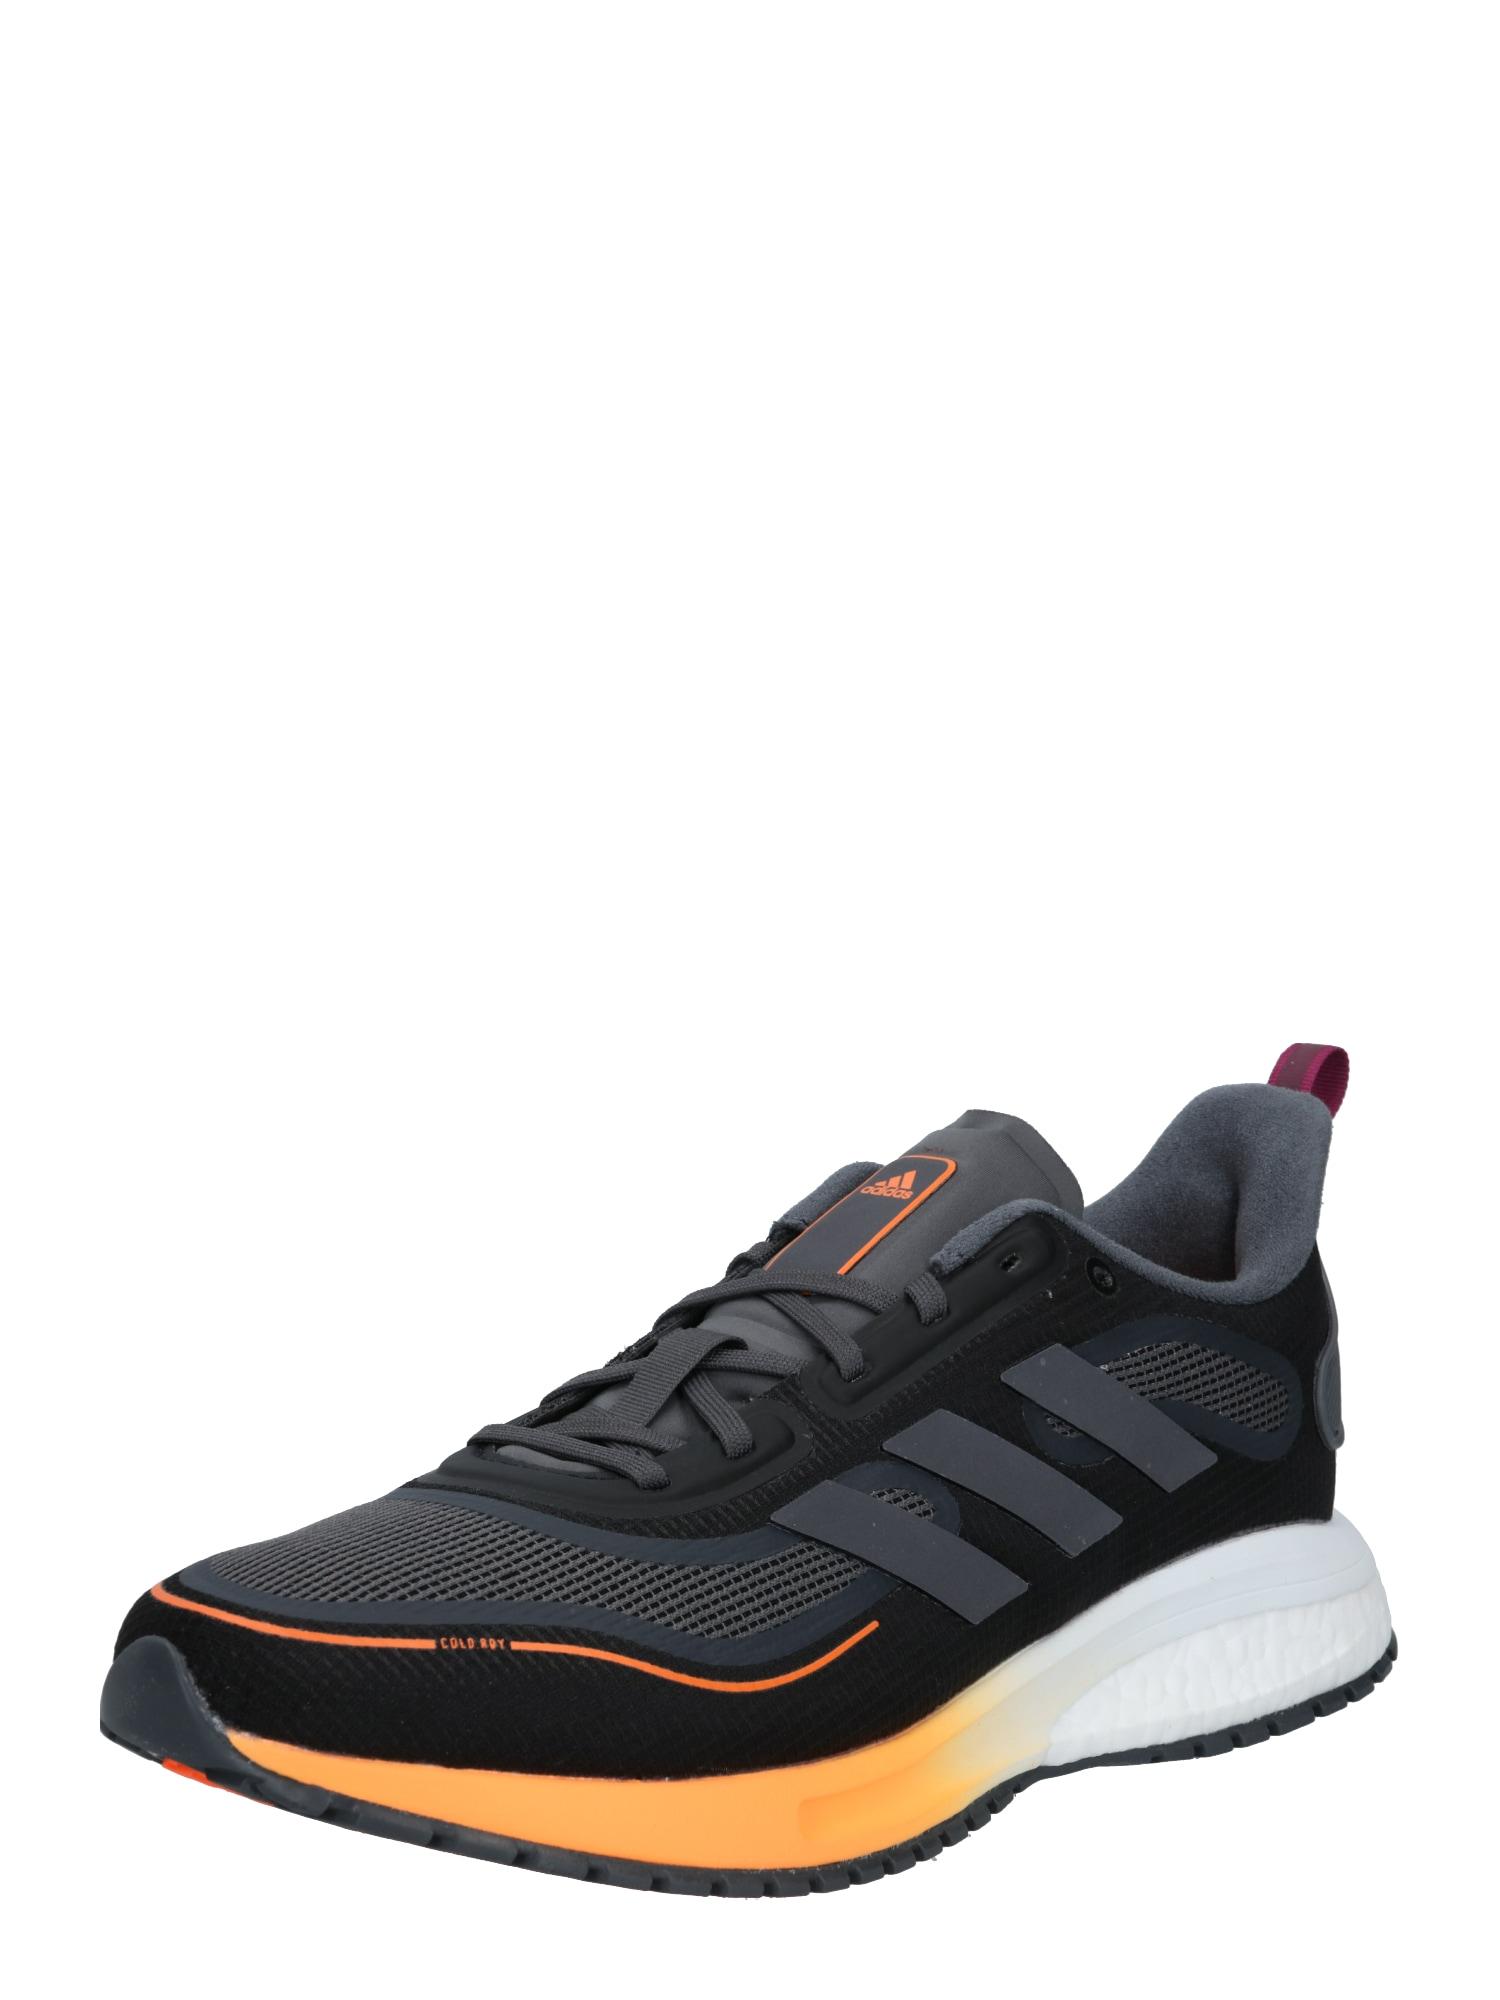 ADIDAS PERFORMANCE Běžecká obuv 'Supernova'  černá / oranžová / bílá / šedá